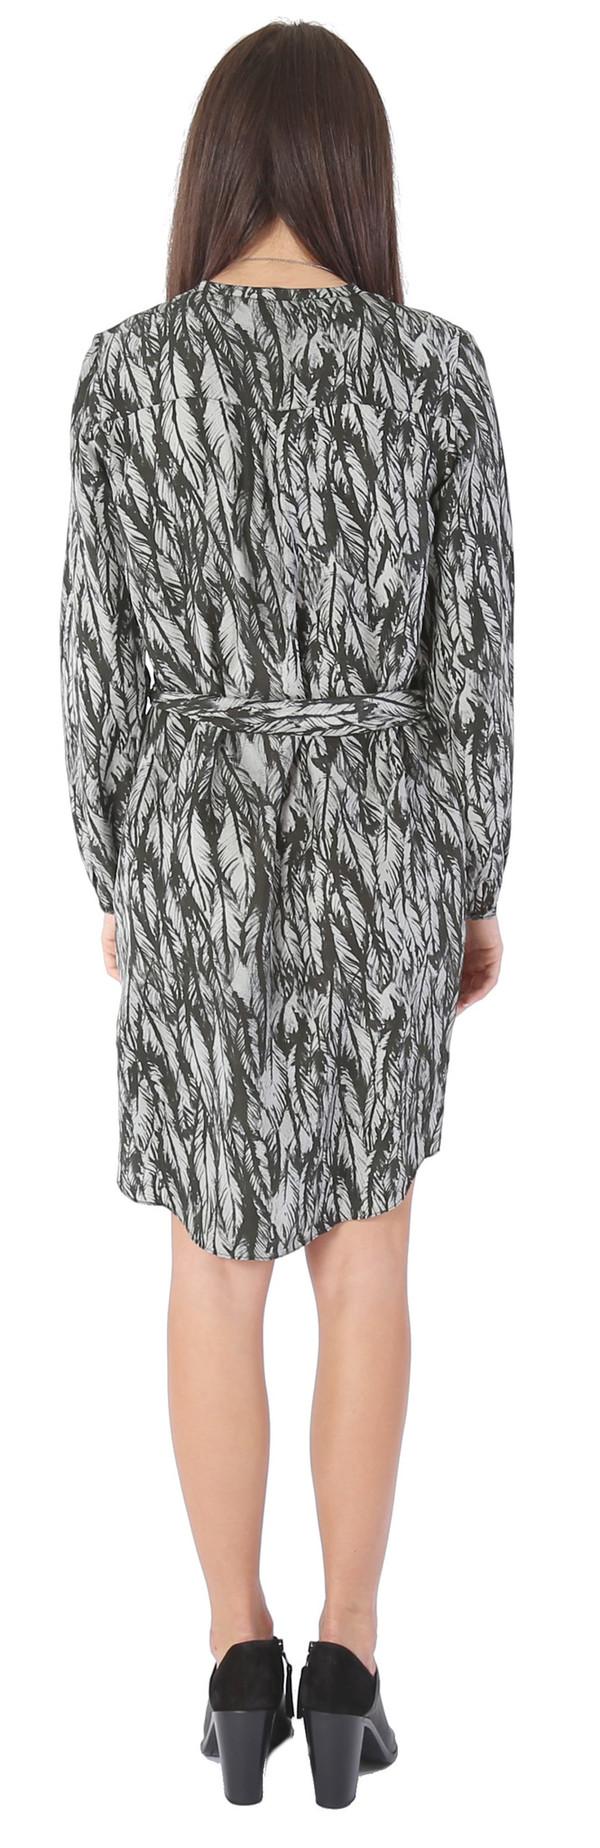 Swildens Pyramid Dress